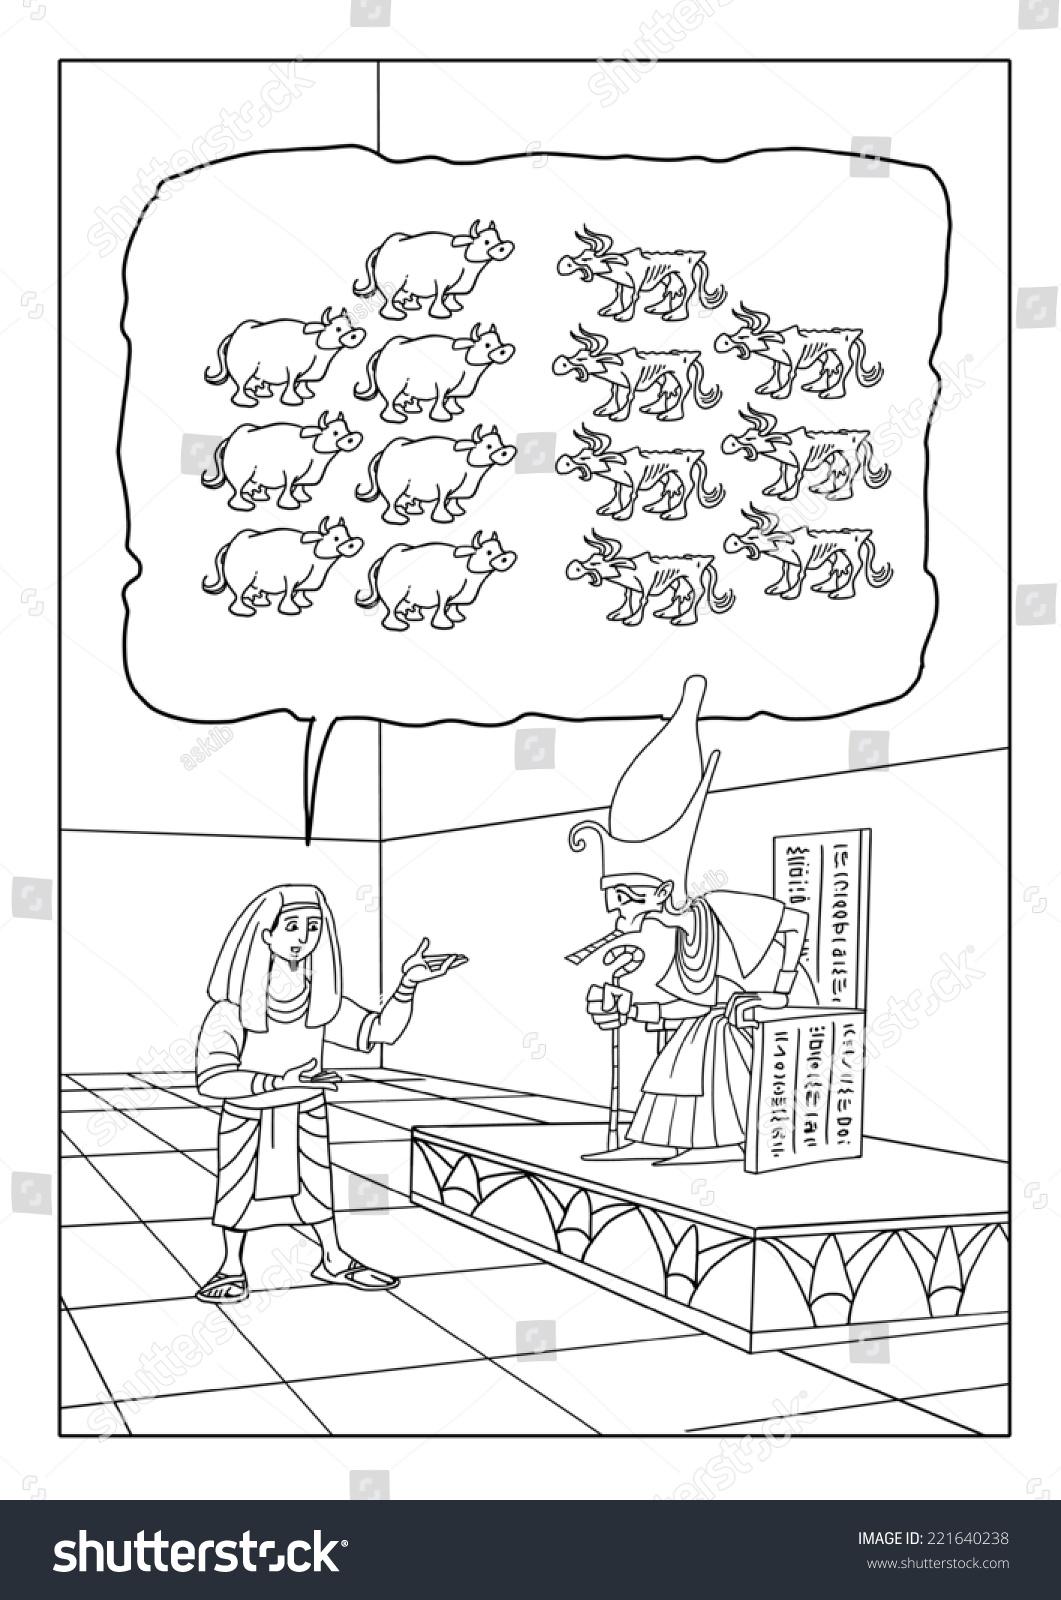 Joseph Interprets Pharaohs Dreams About Seven Stock